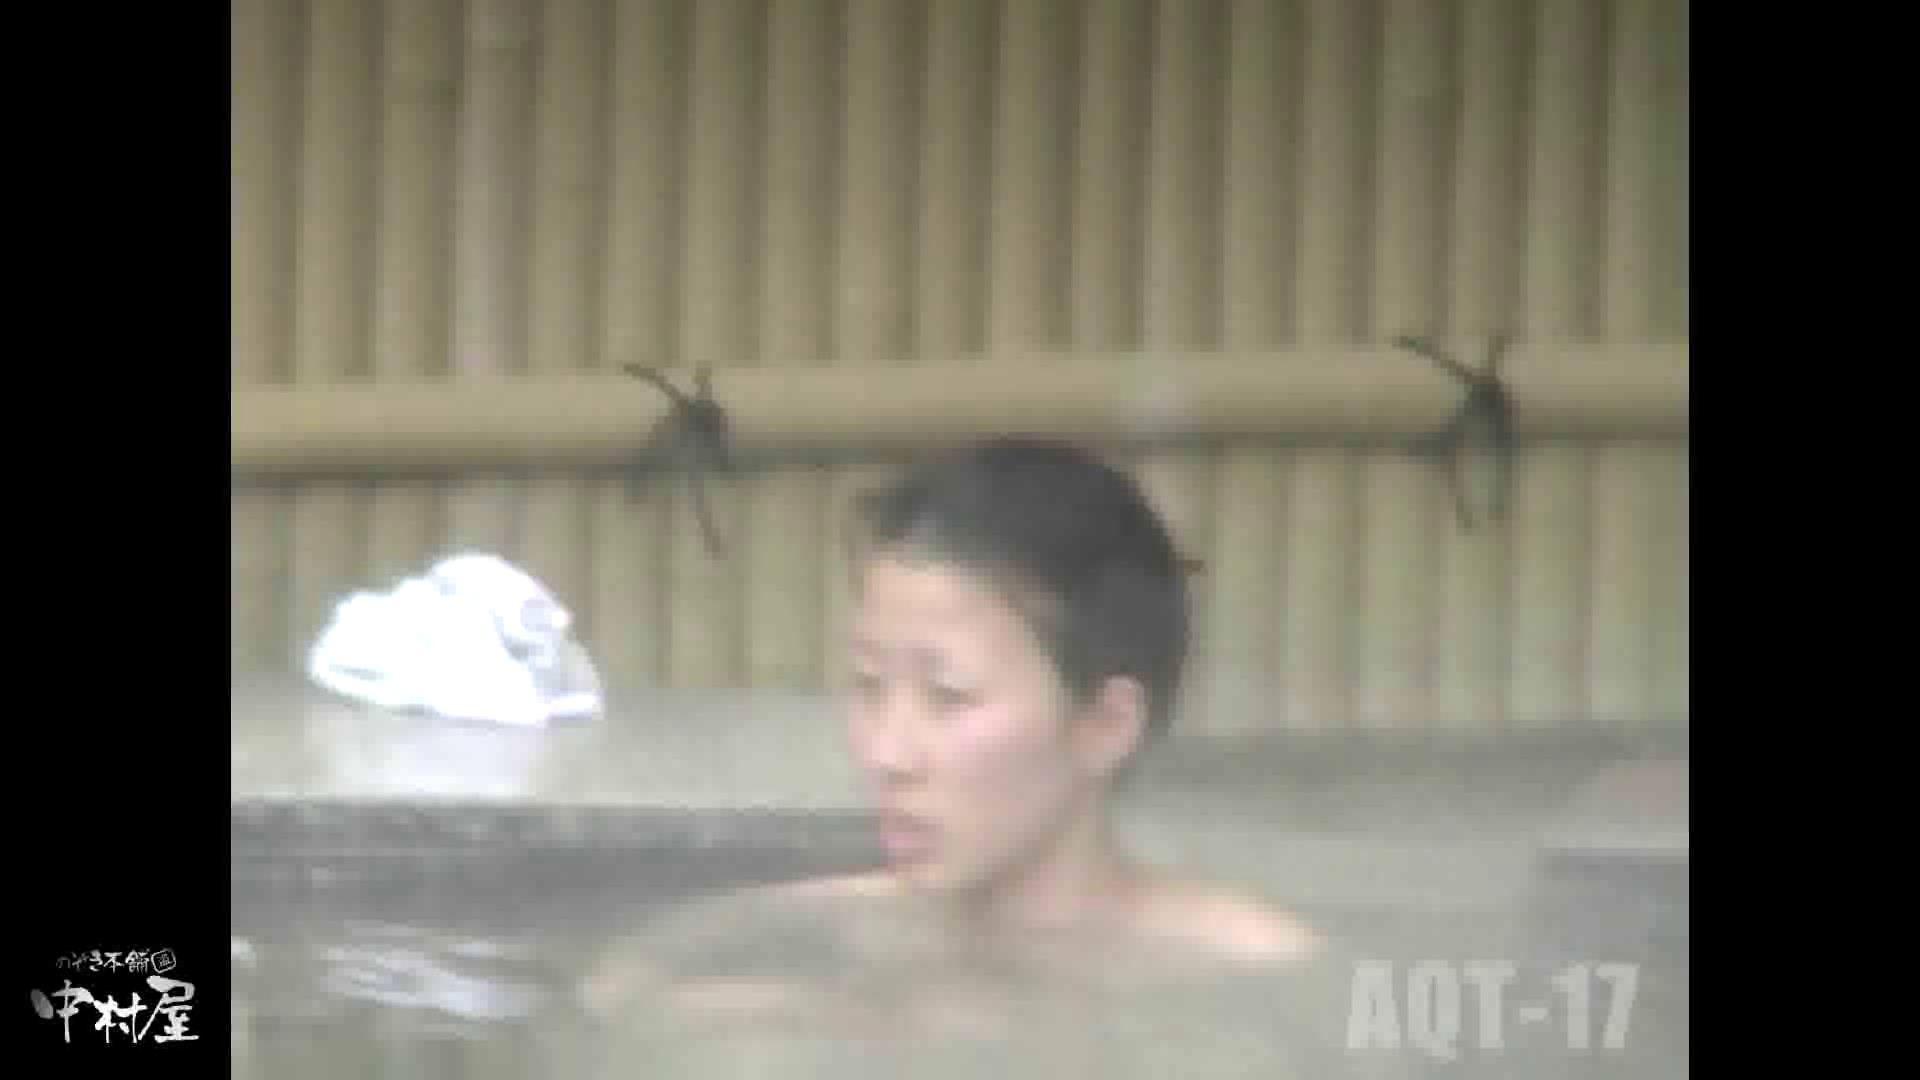 Aquaな露天風呂Vol.881潜入盗撮露天風呂十七判湯 其の二 美しいOLの裸体 スケベ動画紹介 92pic 2